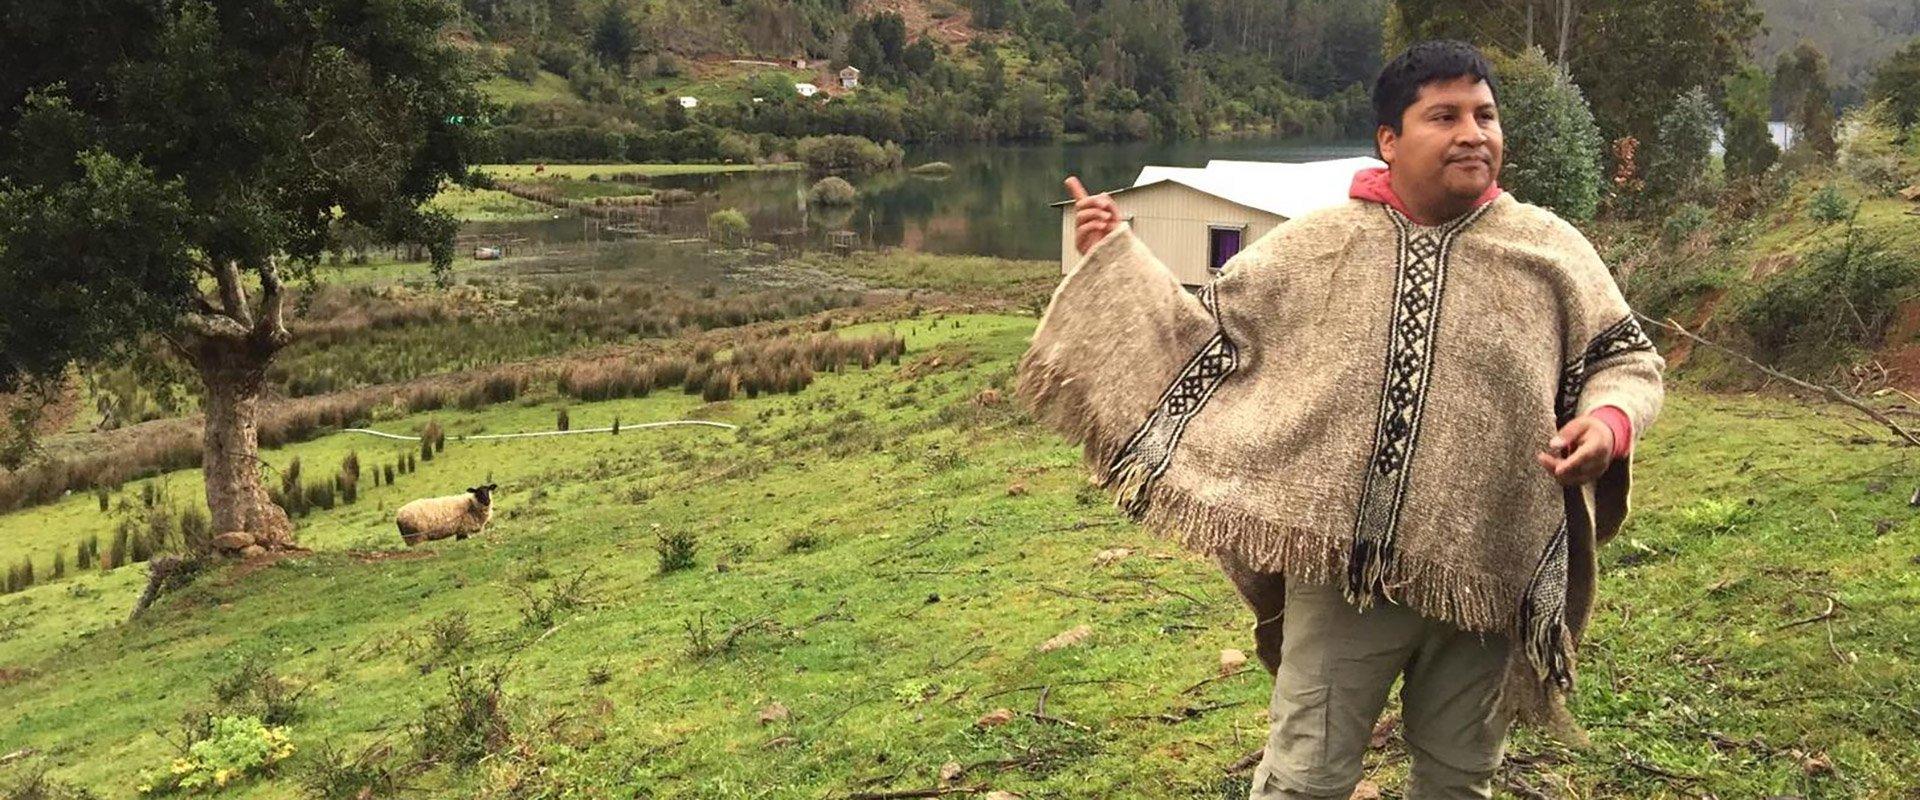 chili indigène mapuche hôte immersion habitant